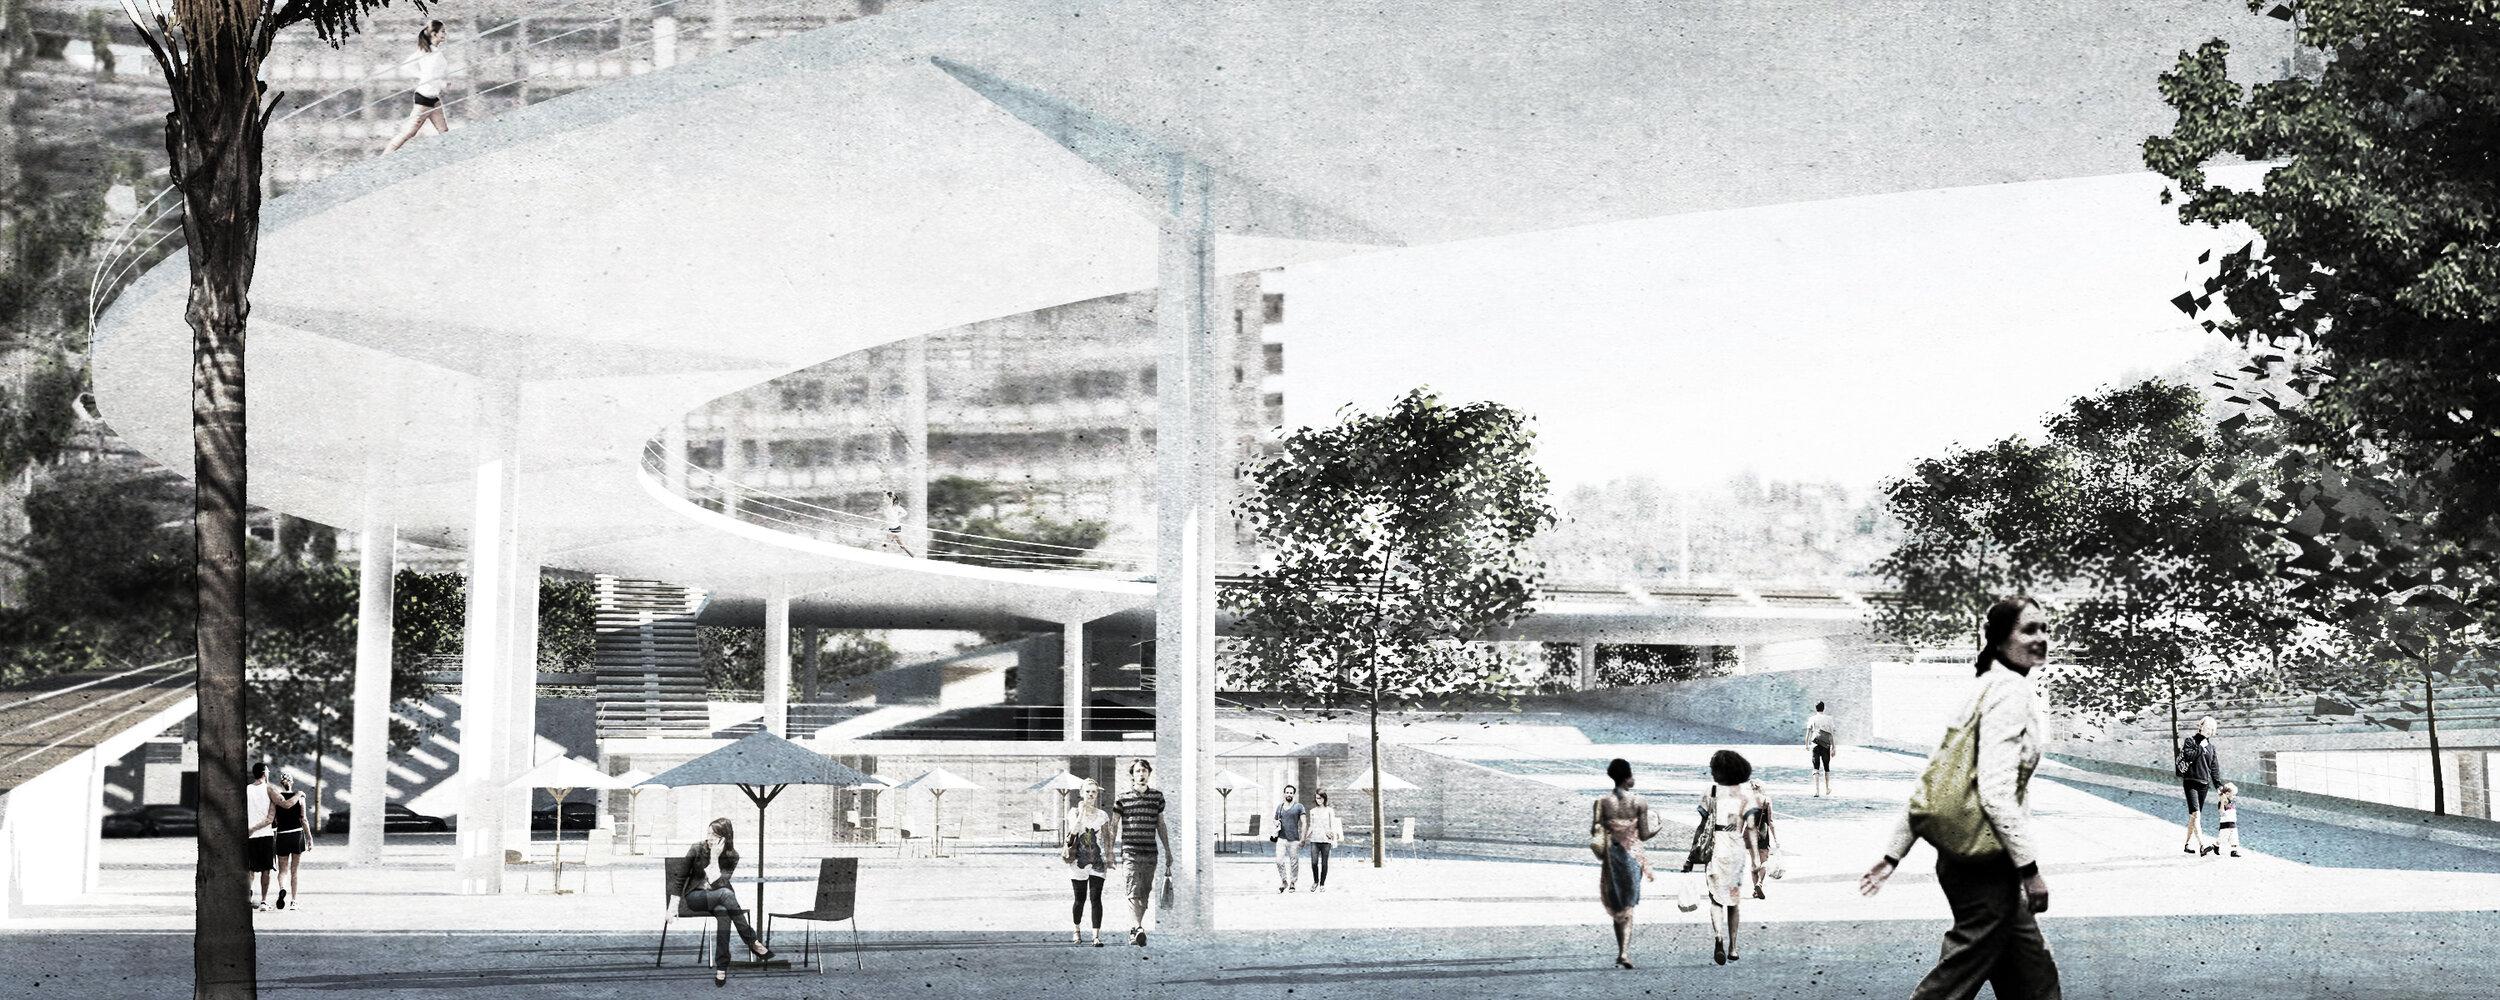 Under Track Entrance View2.jpg